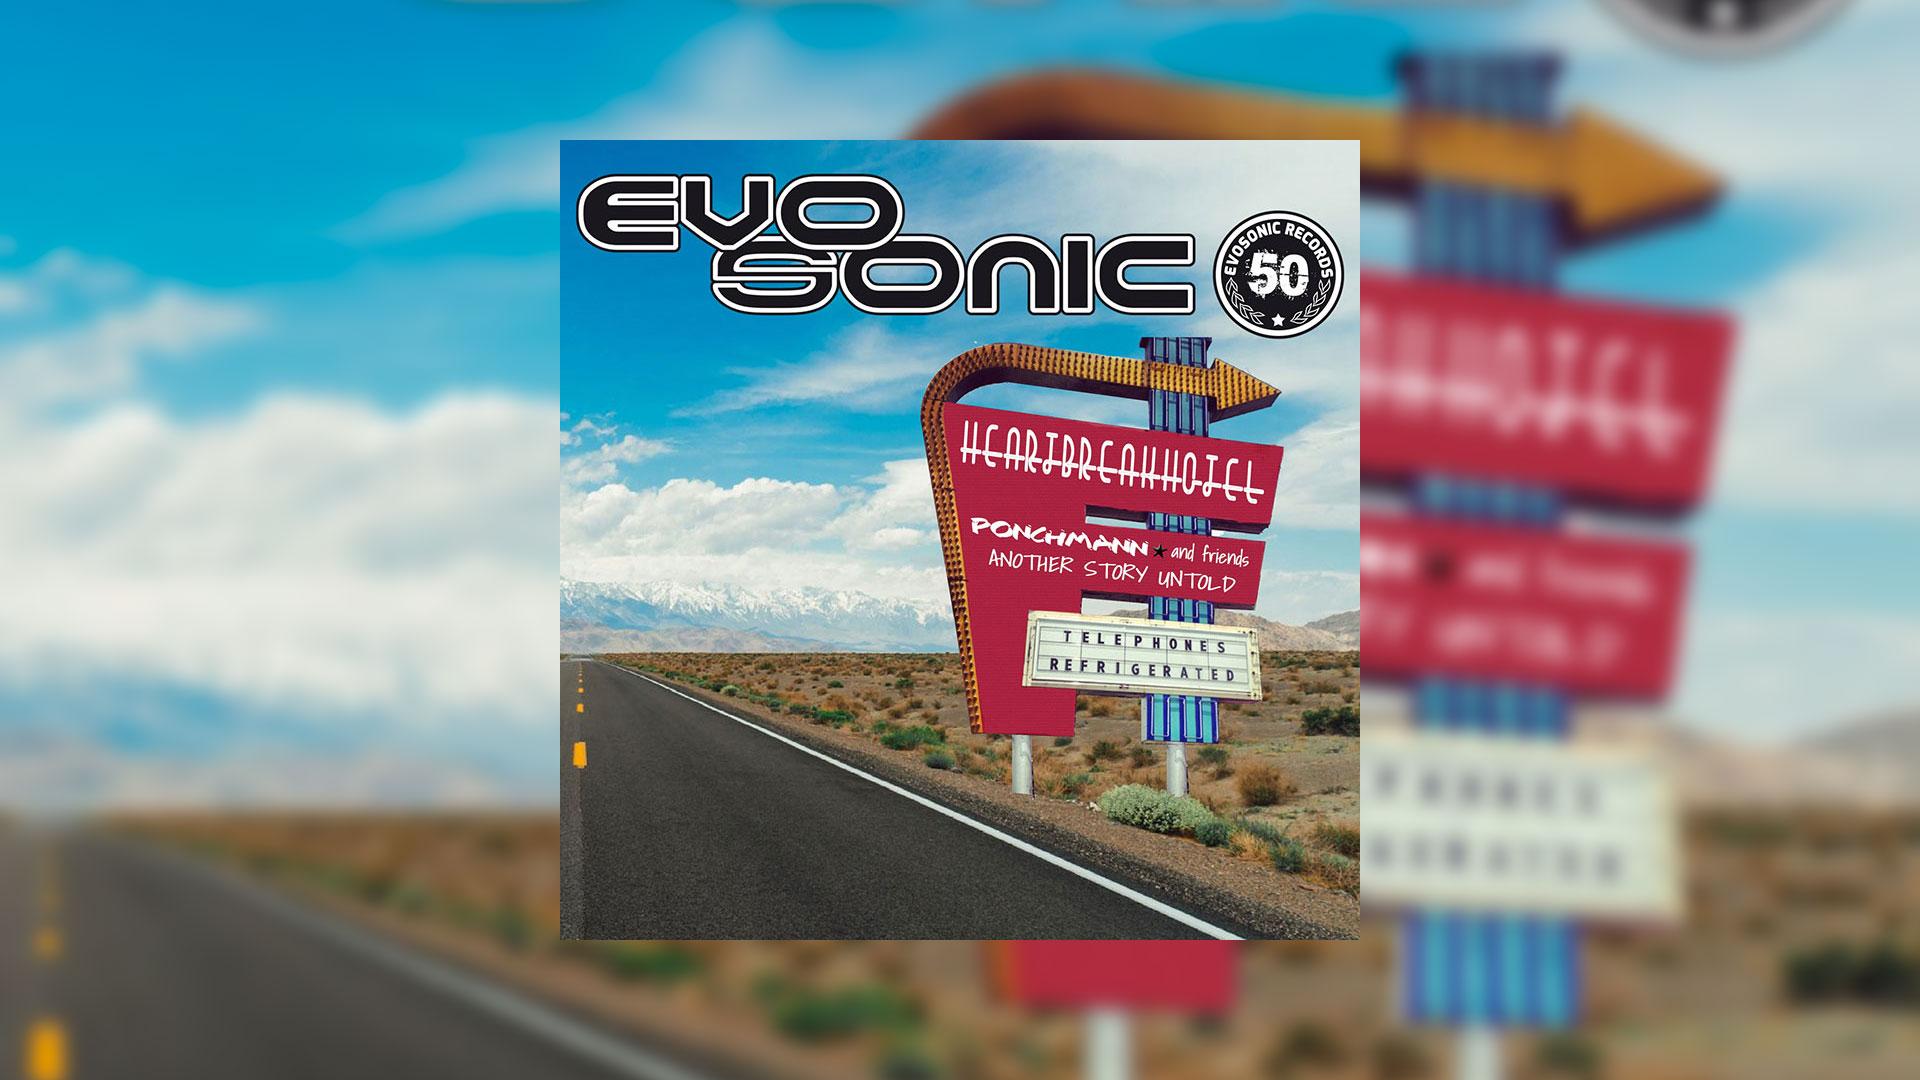 Evosonic-Records-EVO050